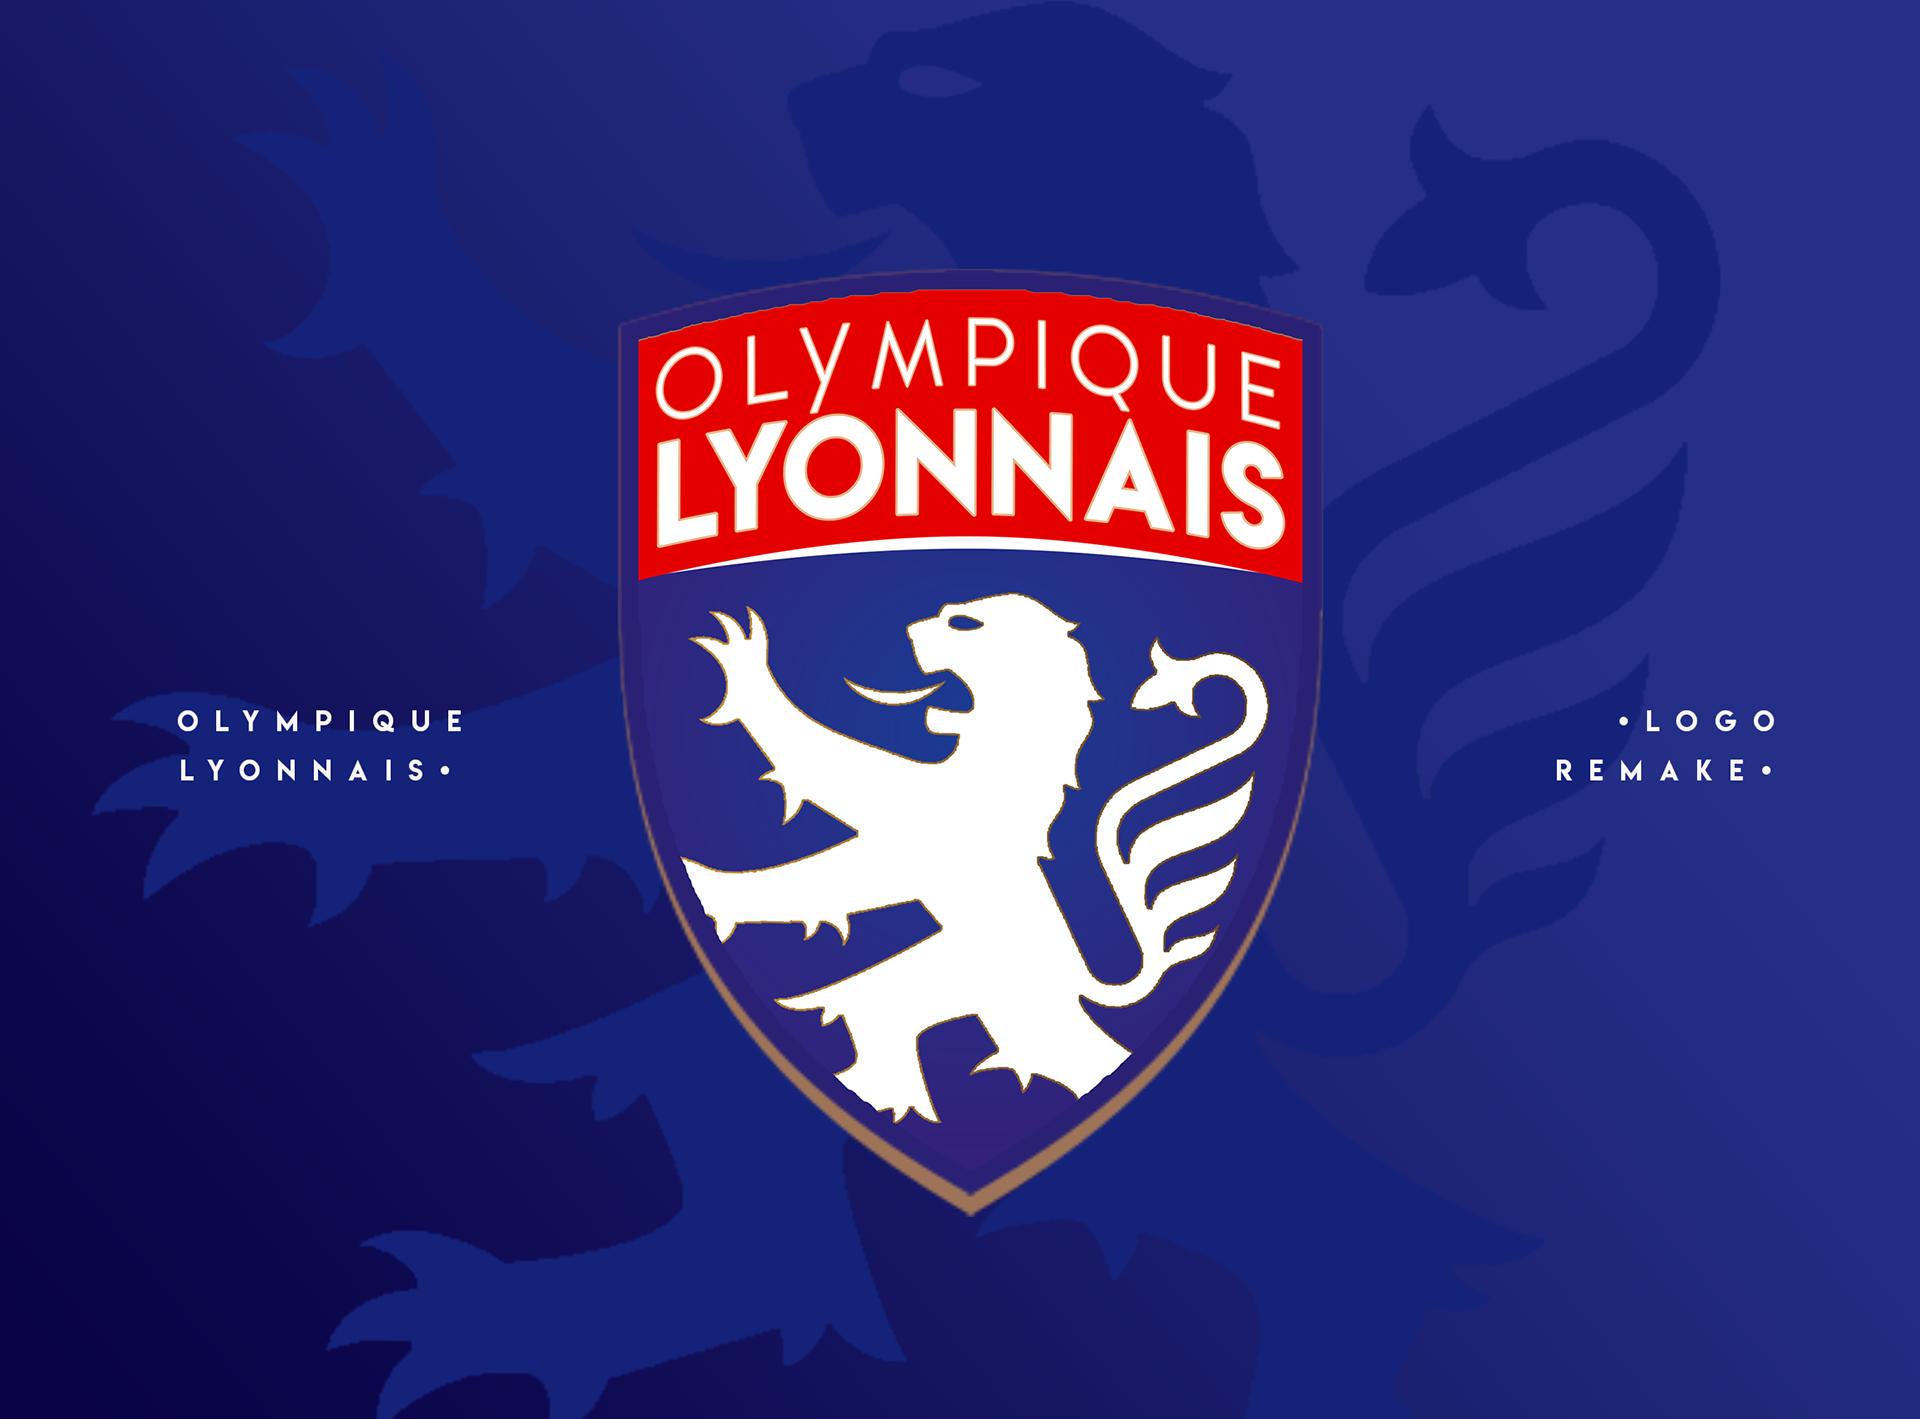 Cosmin becheanu olympique lyonnais logo remake - Logo olympique lyonnais ...